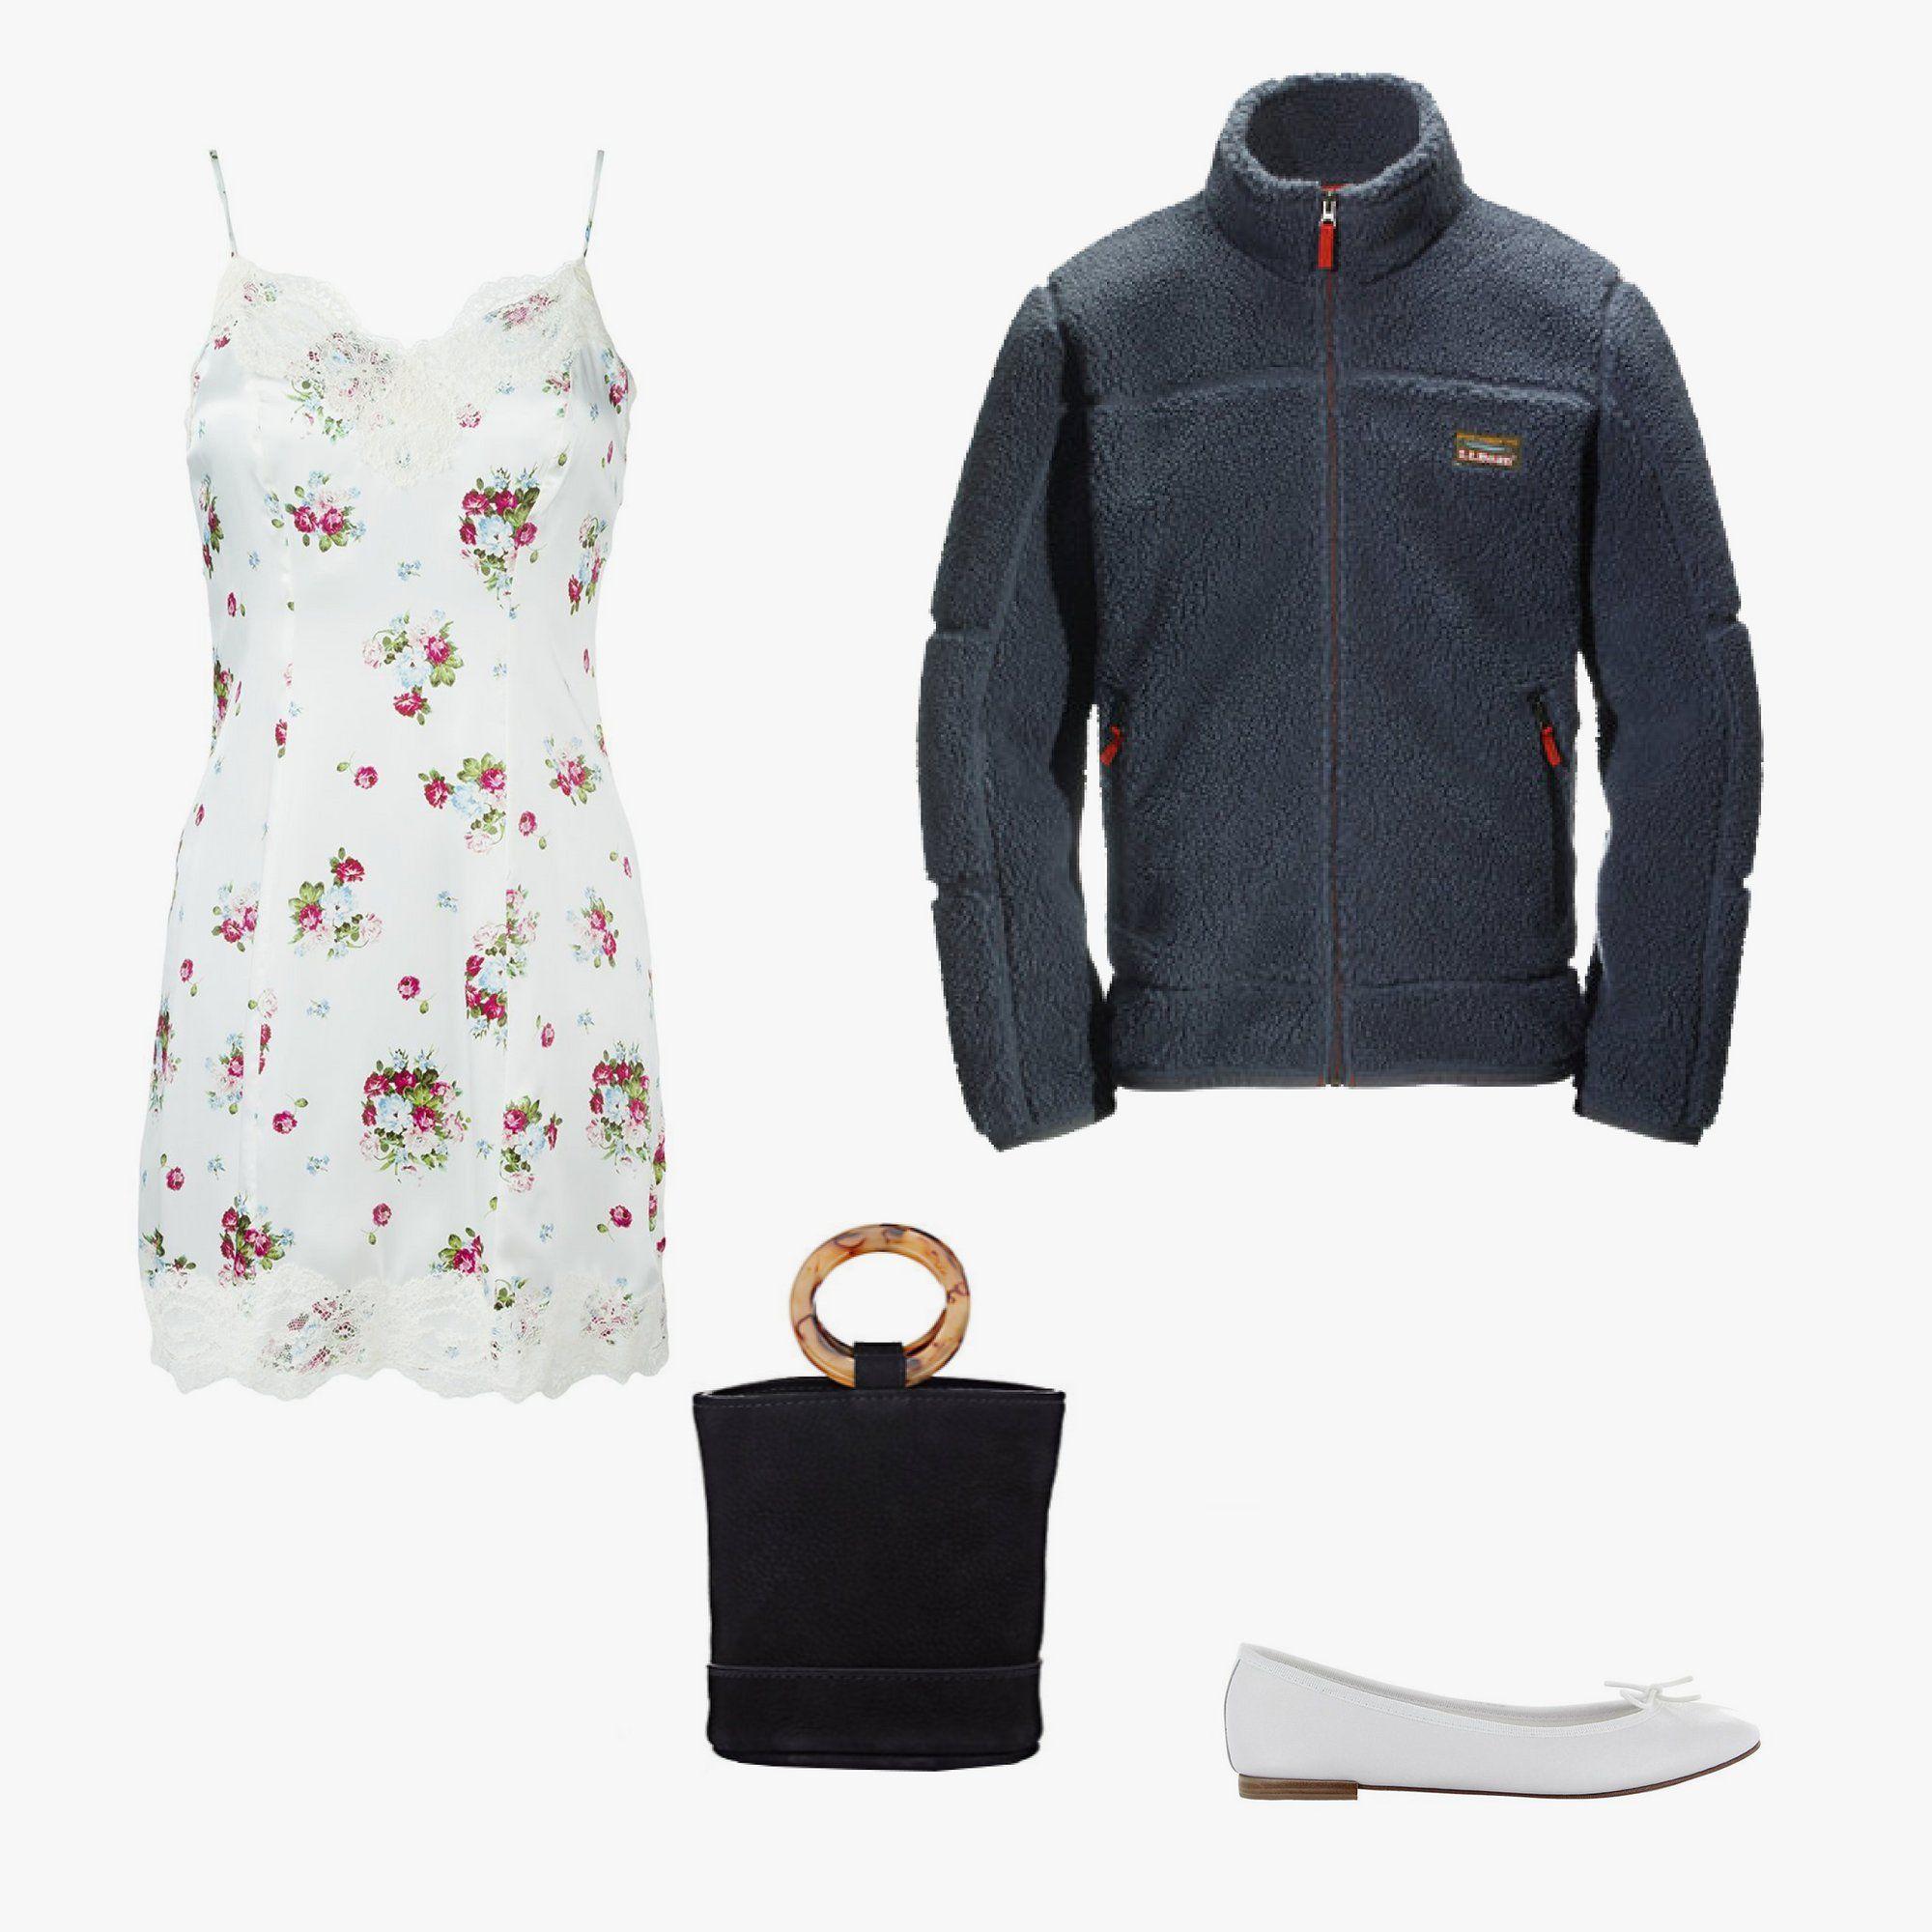 Dondup floral-print slip dress, $168, farfetch.com; L.L. Bean Mountain Pile fleece jacket, $89, llbean.com;Repetto Cendrillon ballerina flats, $295, repetto.com; Simon Miller Bonsai bucket bag, $390, barneys.com